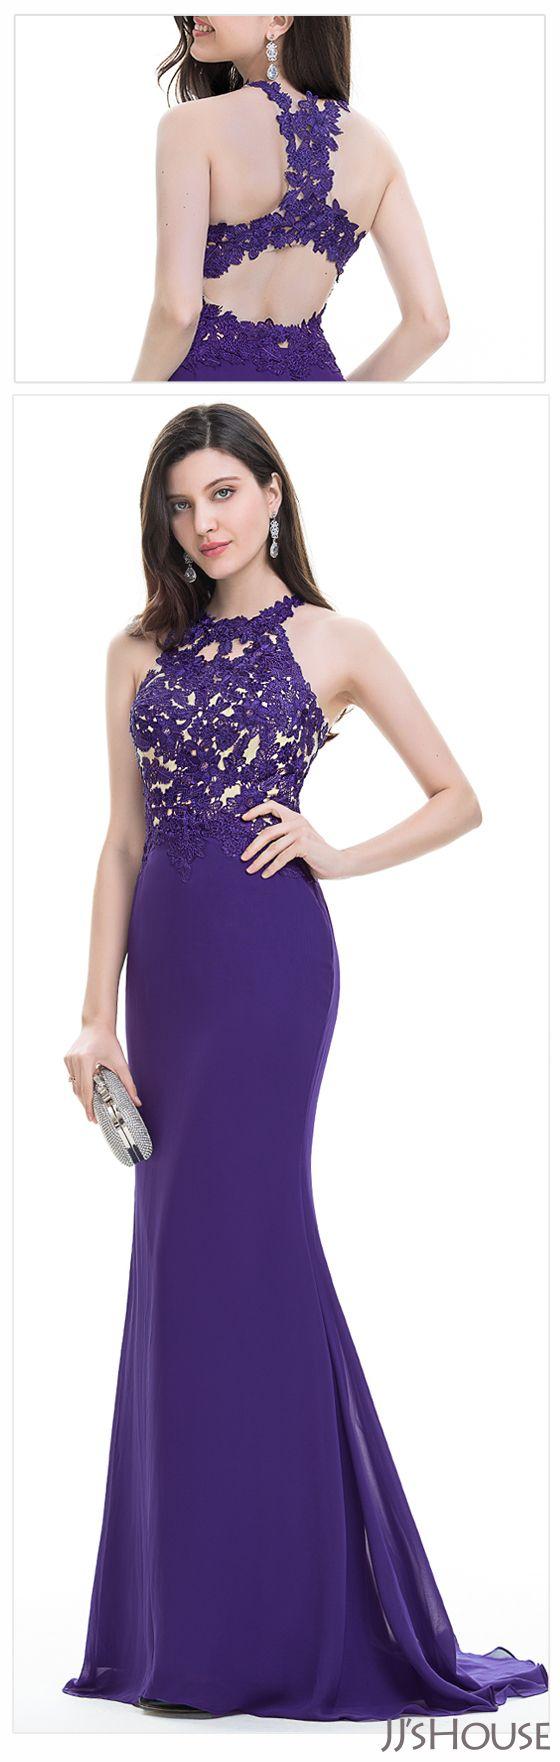 250 best Vestidos fiesta images on Pinterest | Cute dresses, Bridal ...